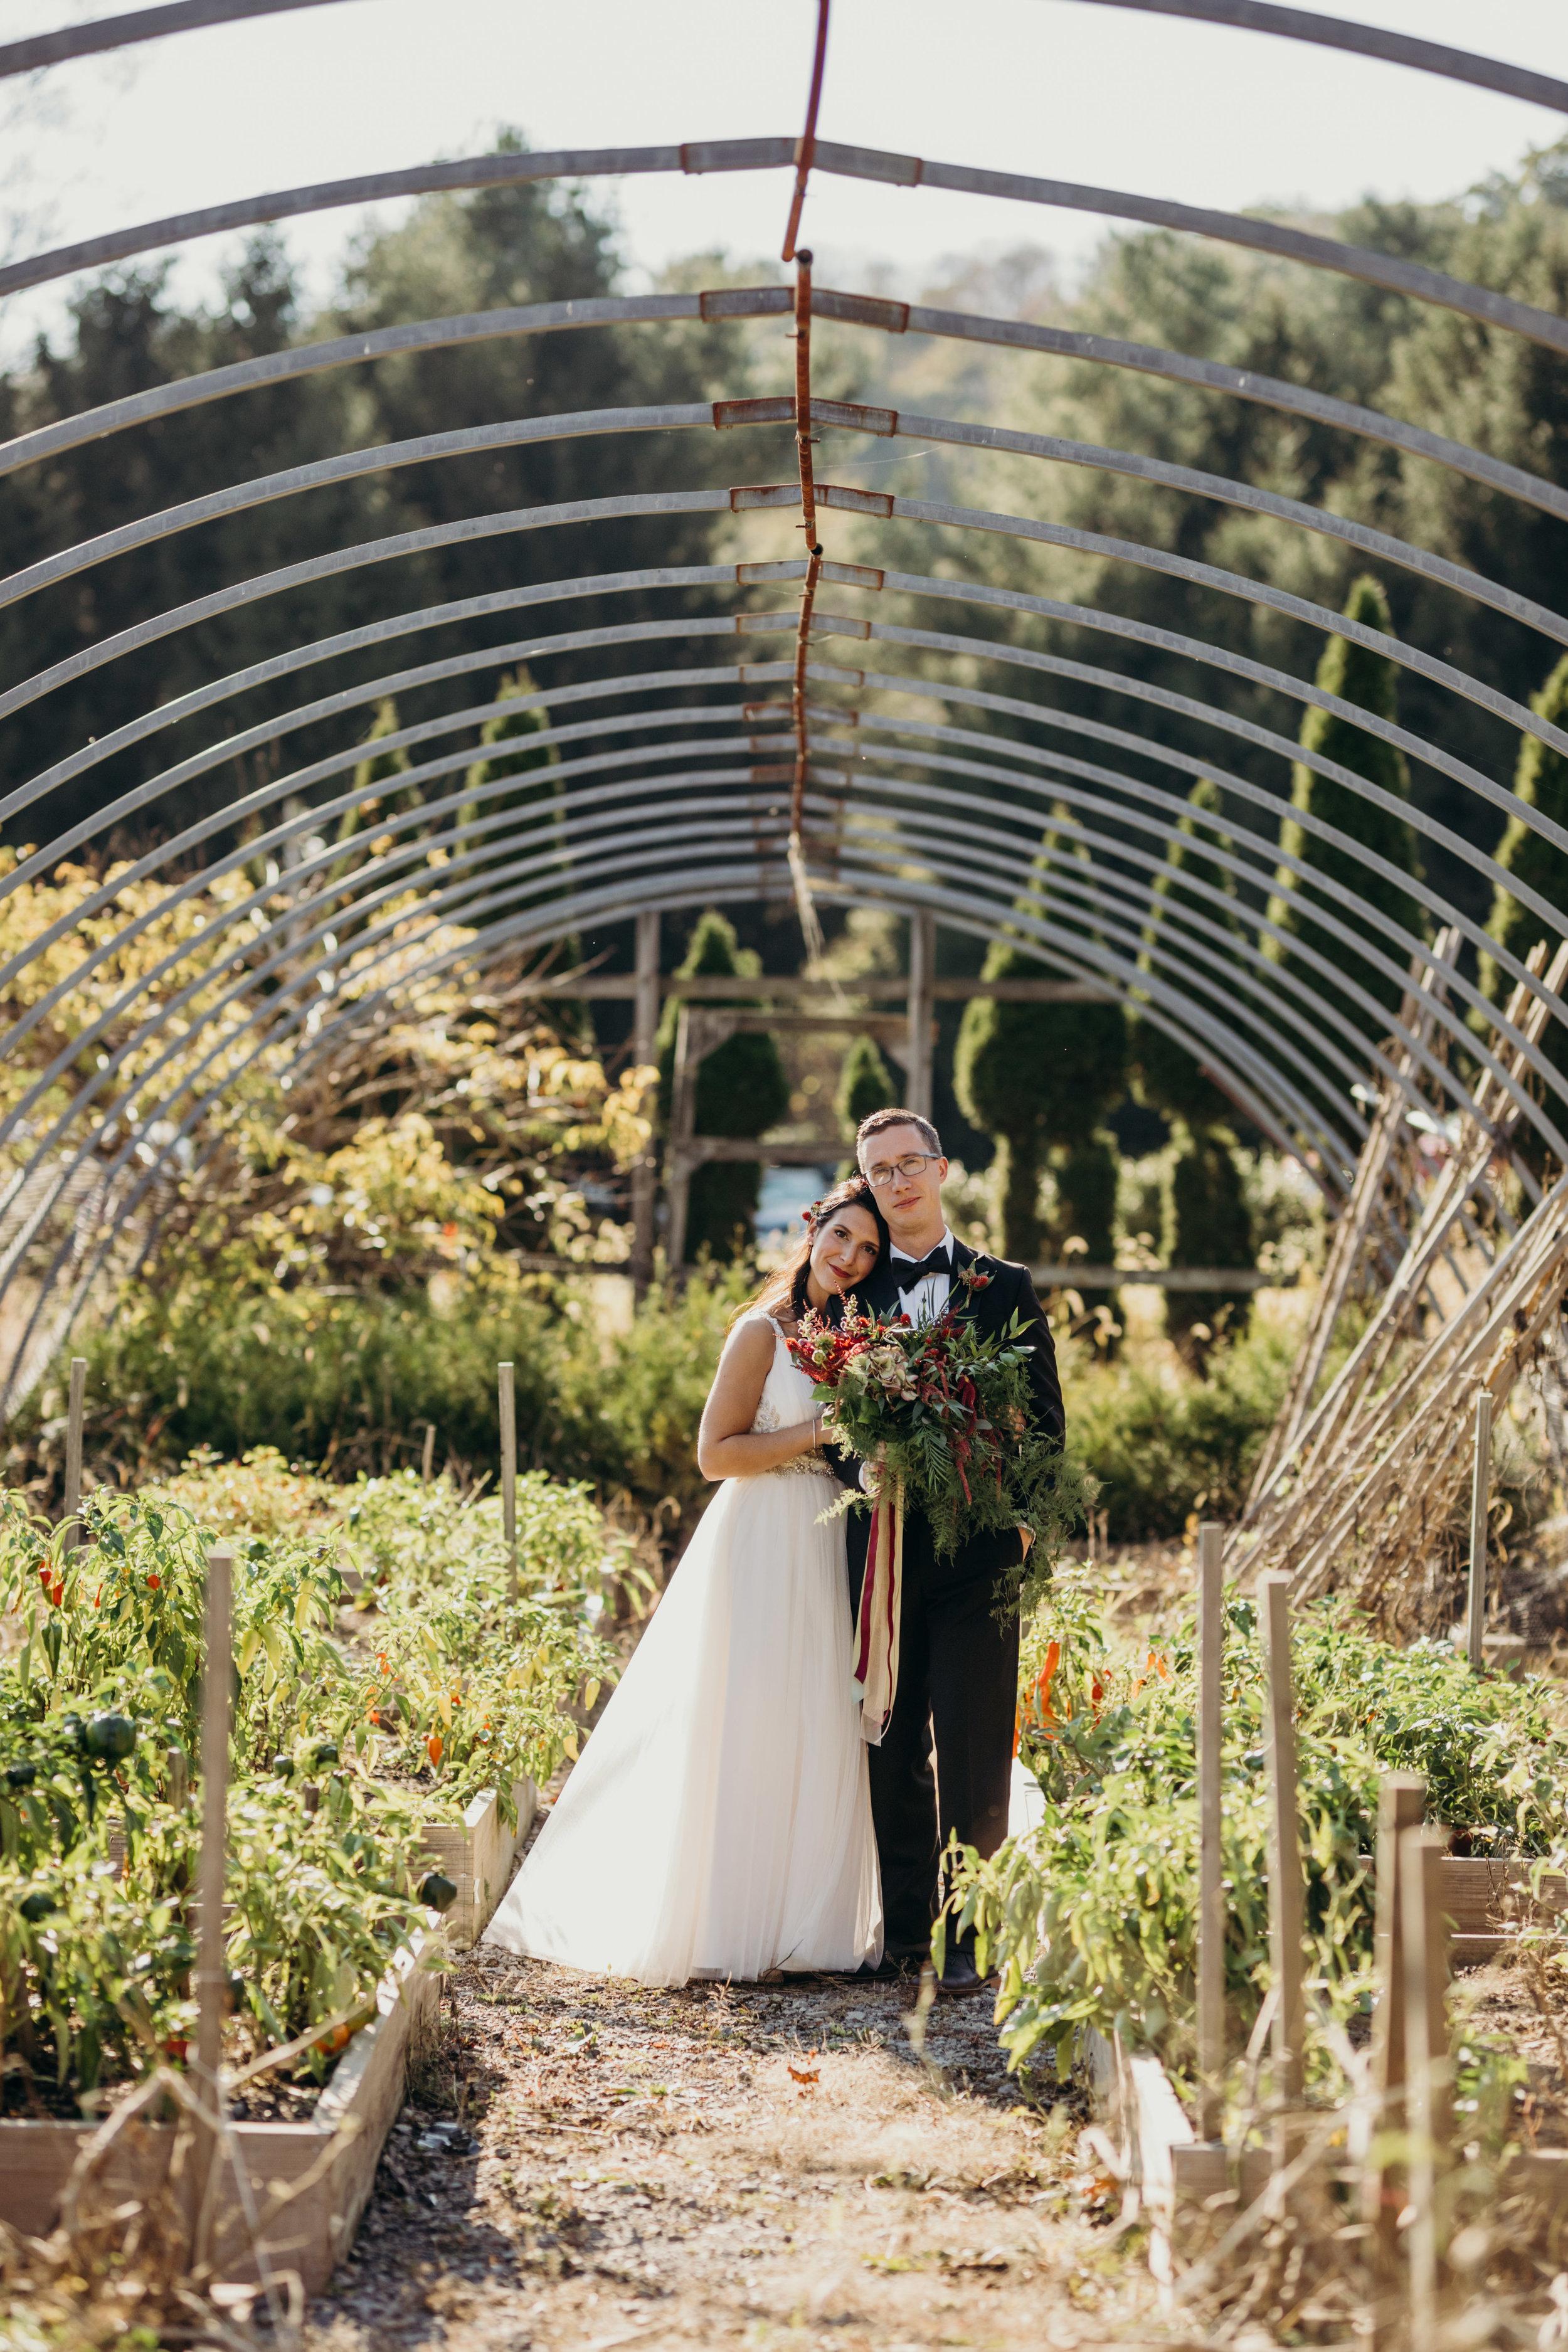 Stonebridge Farm Nursery wedding - Rachael and Pete-278.jpg